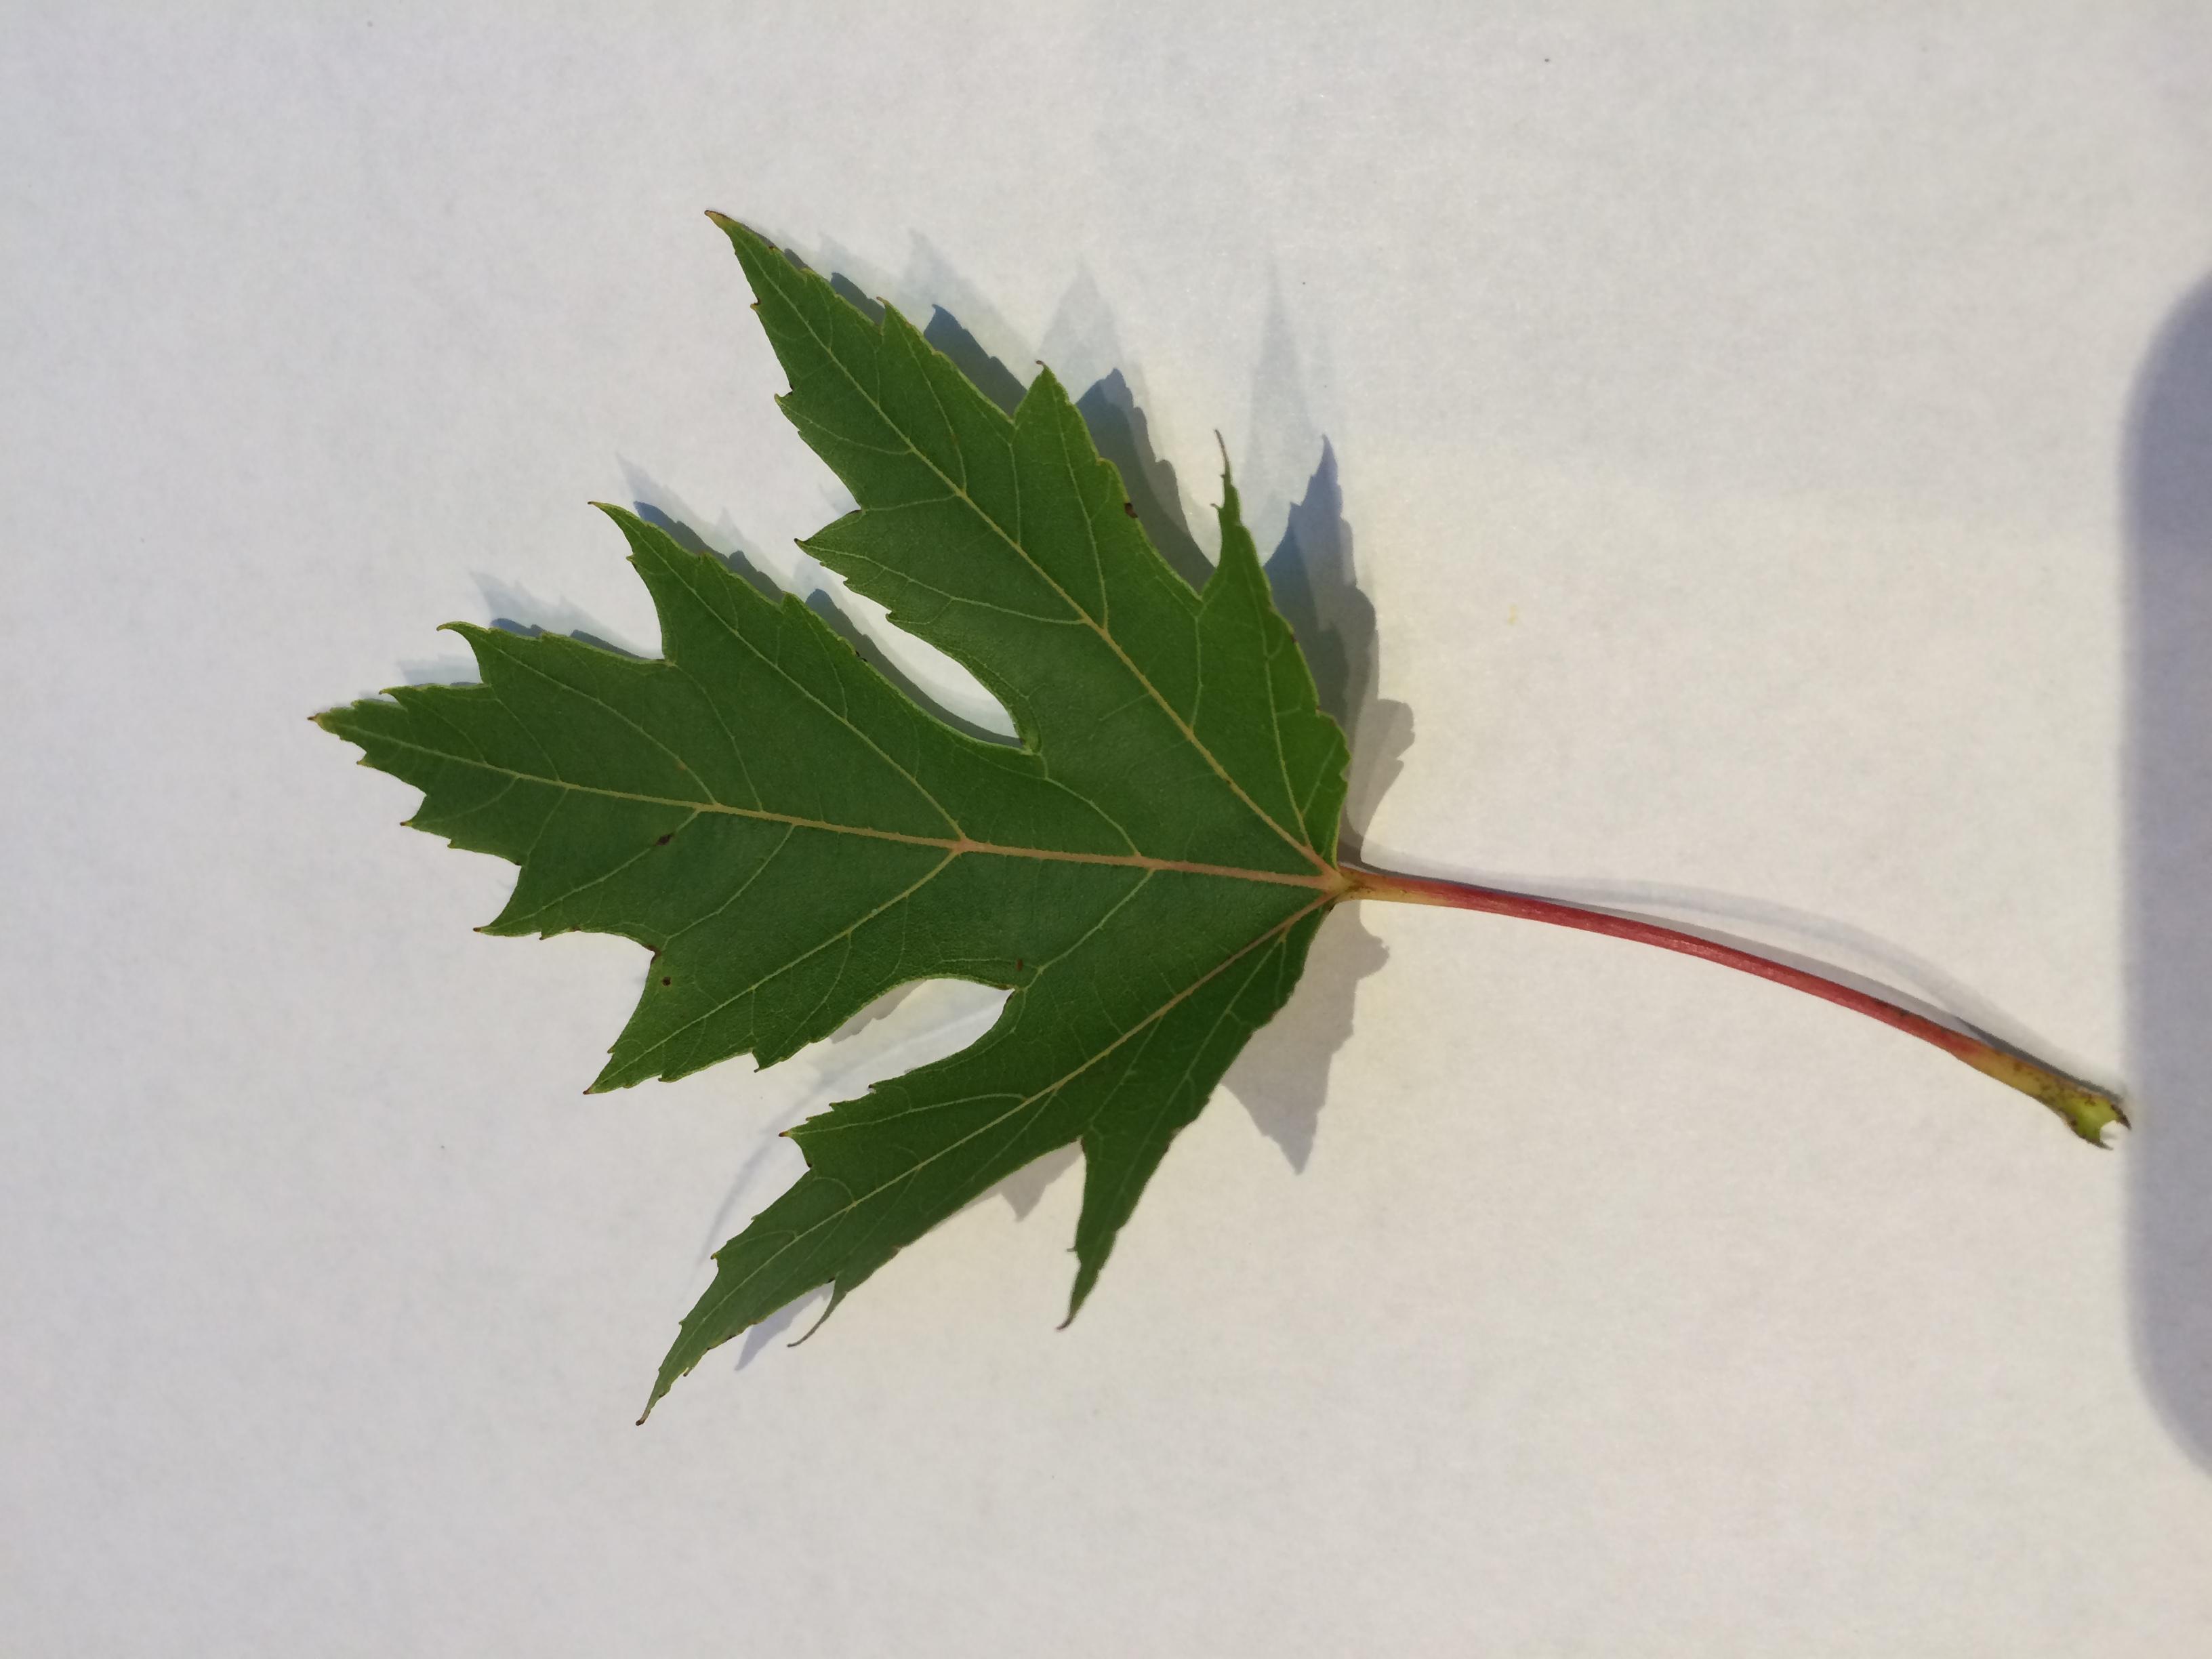 gwl/static/gwl/images/new-leaves/green-4.jpg